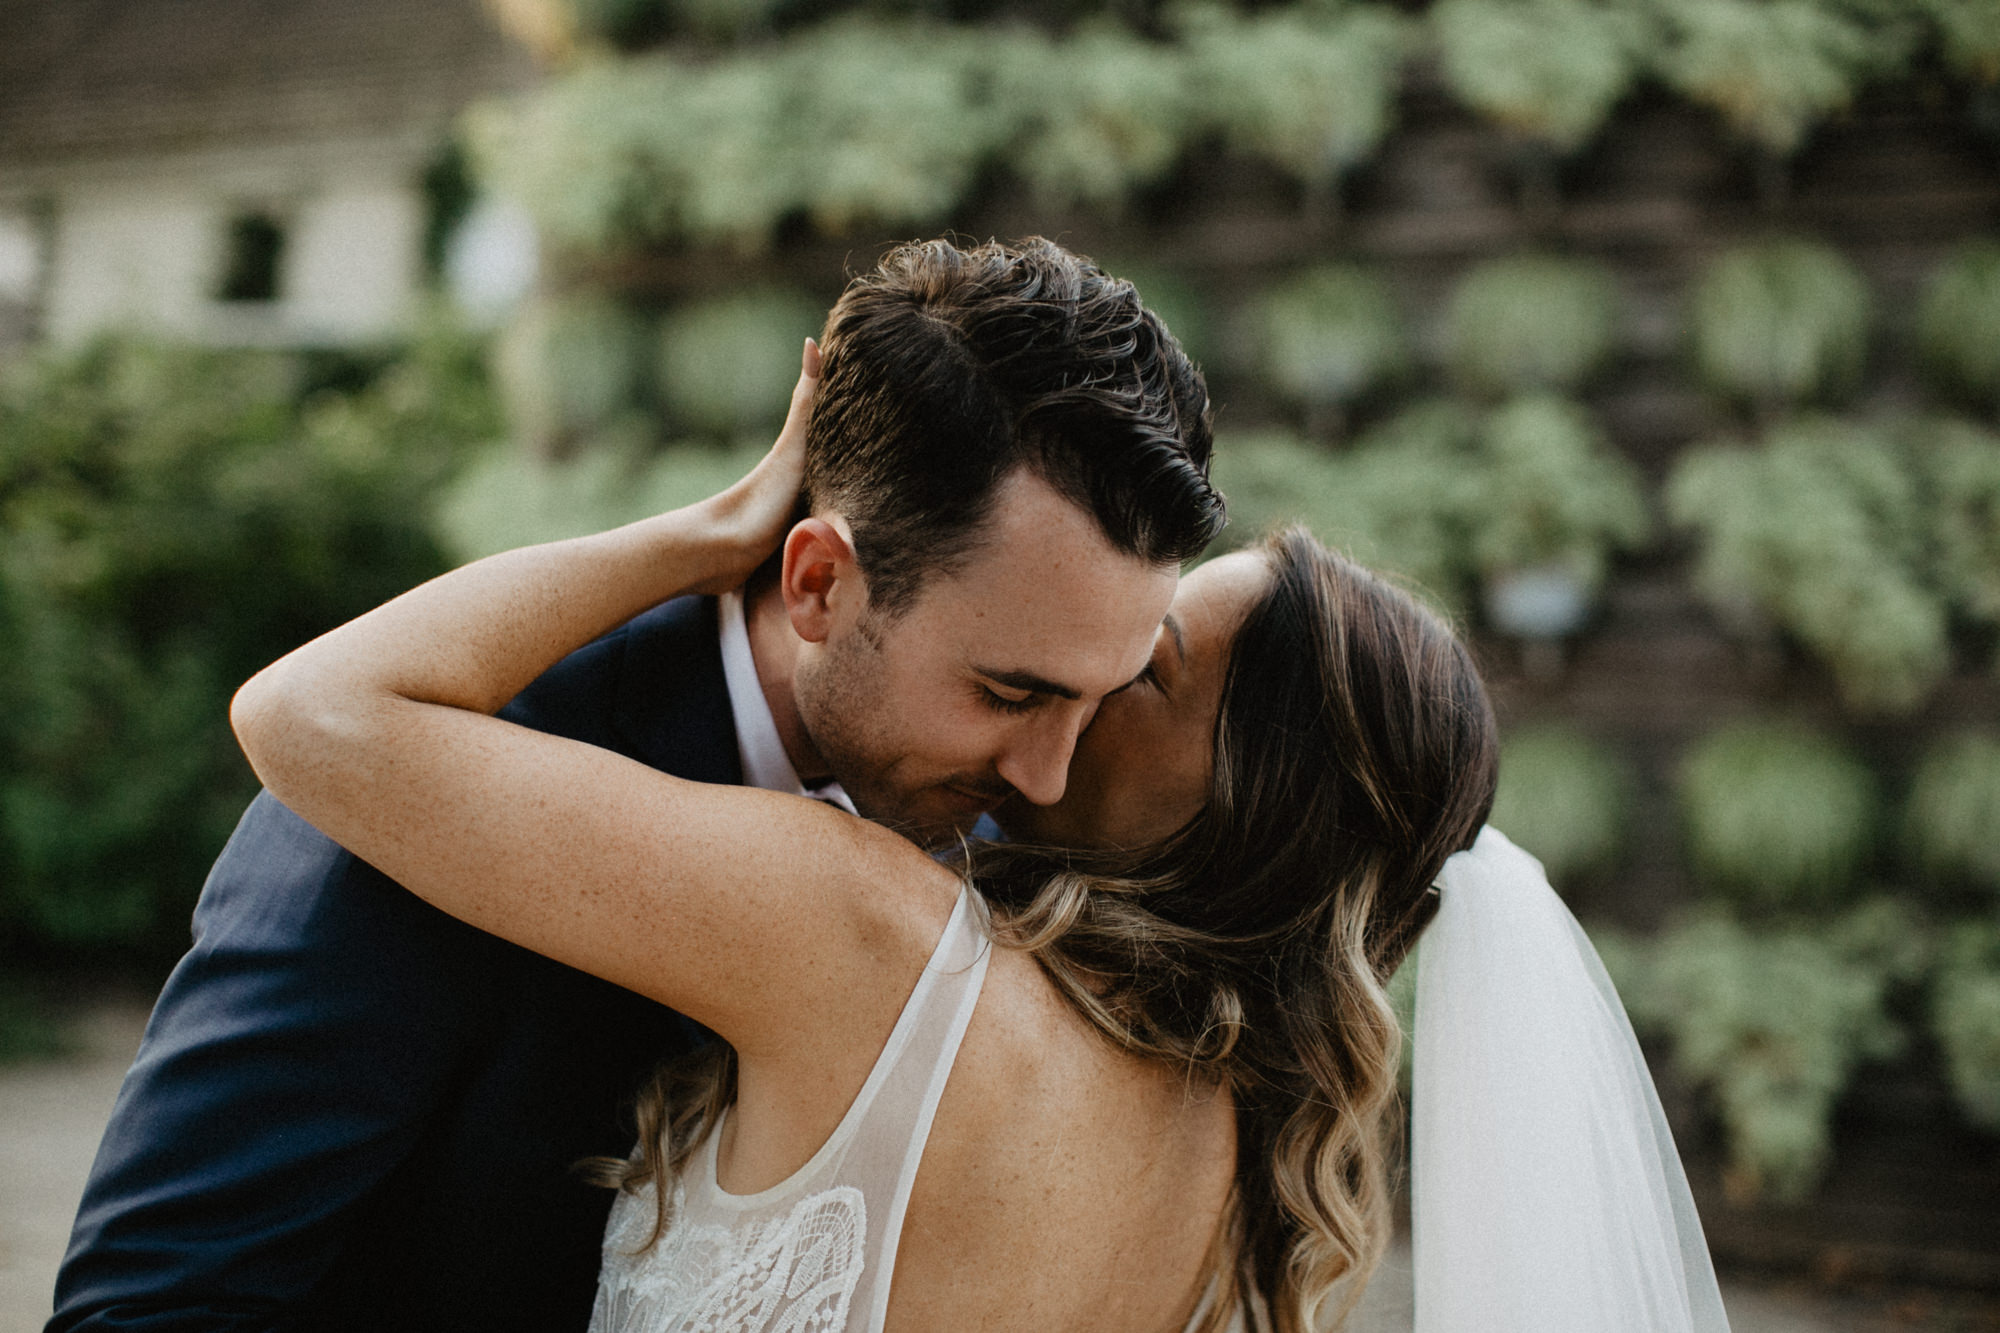 terrain-events-wedding-photographer-44.jpg